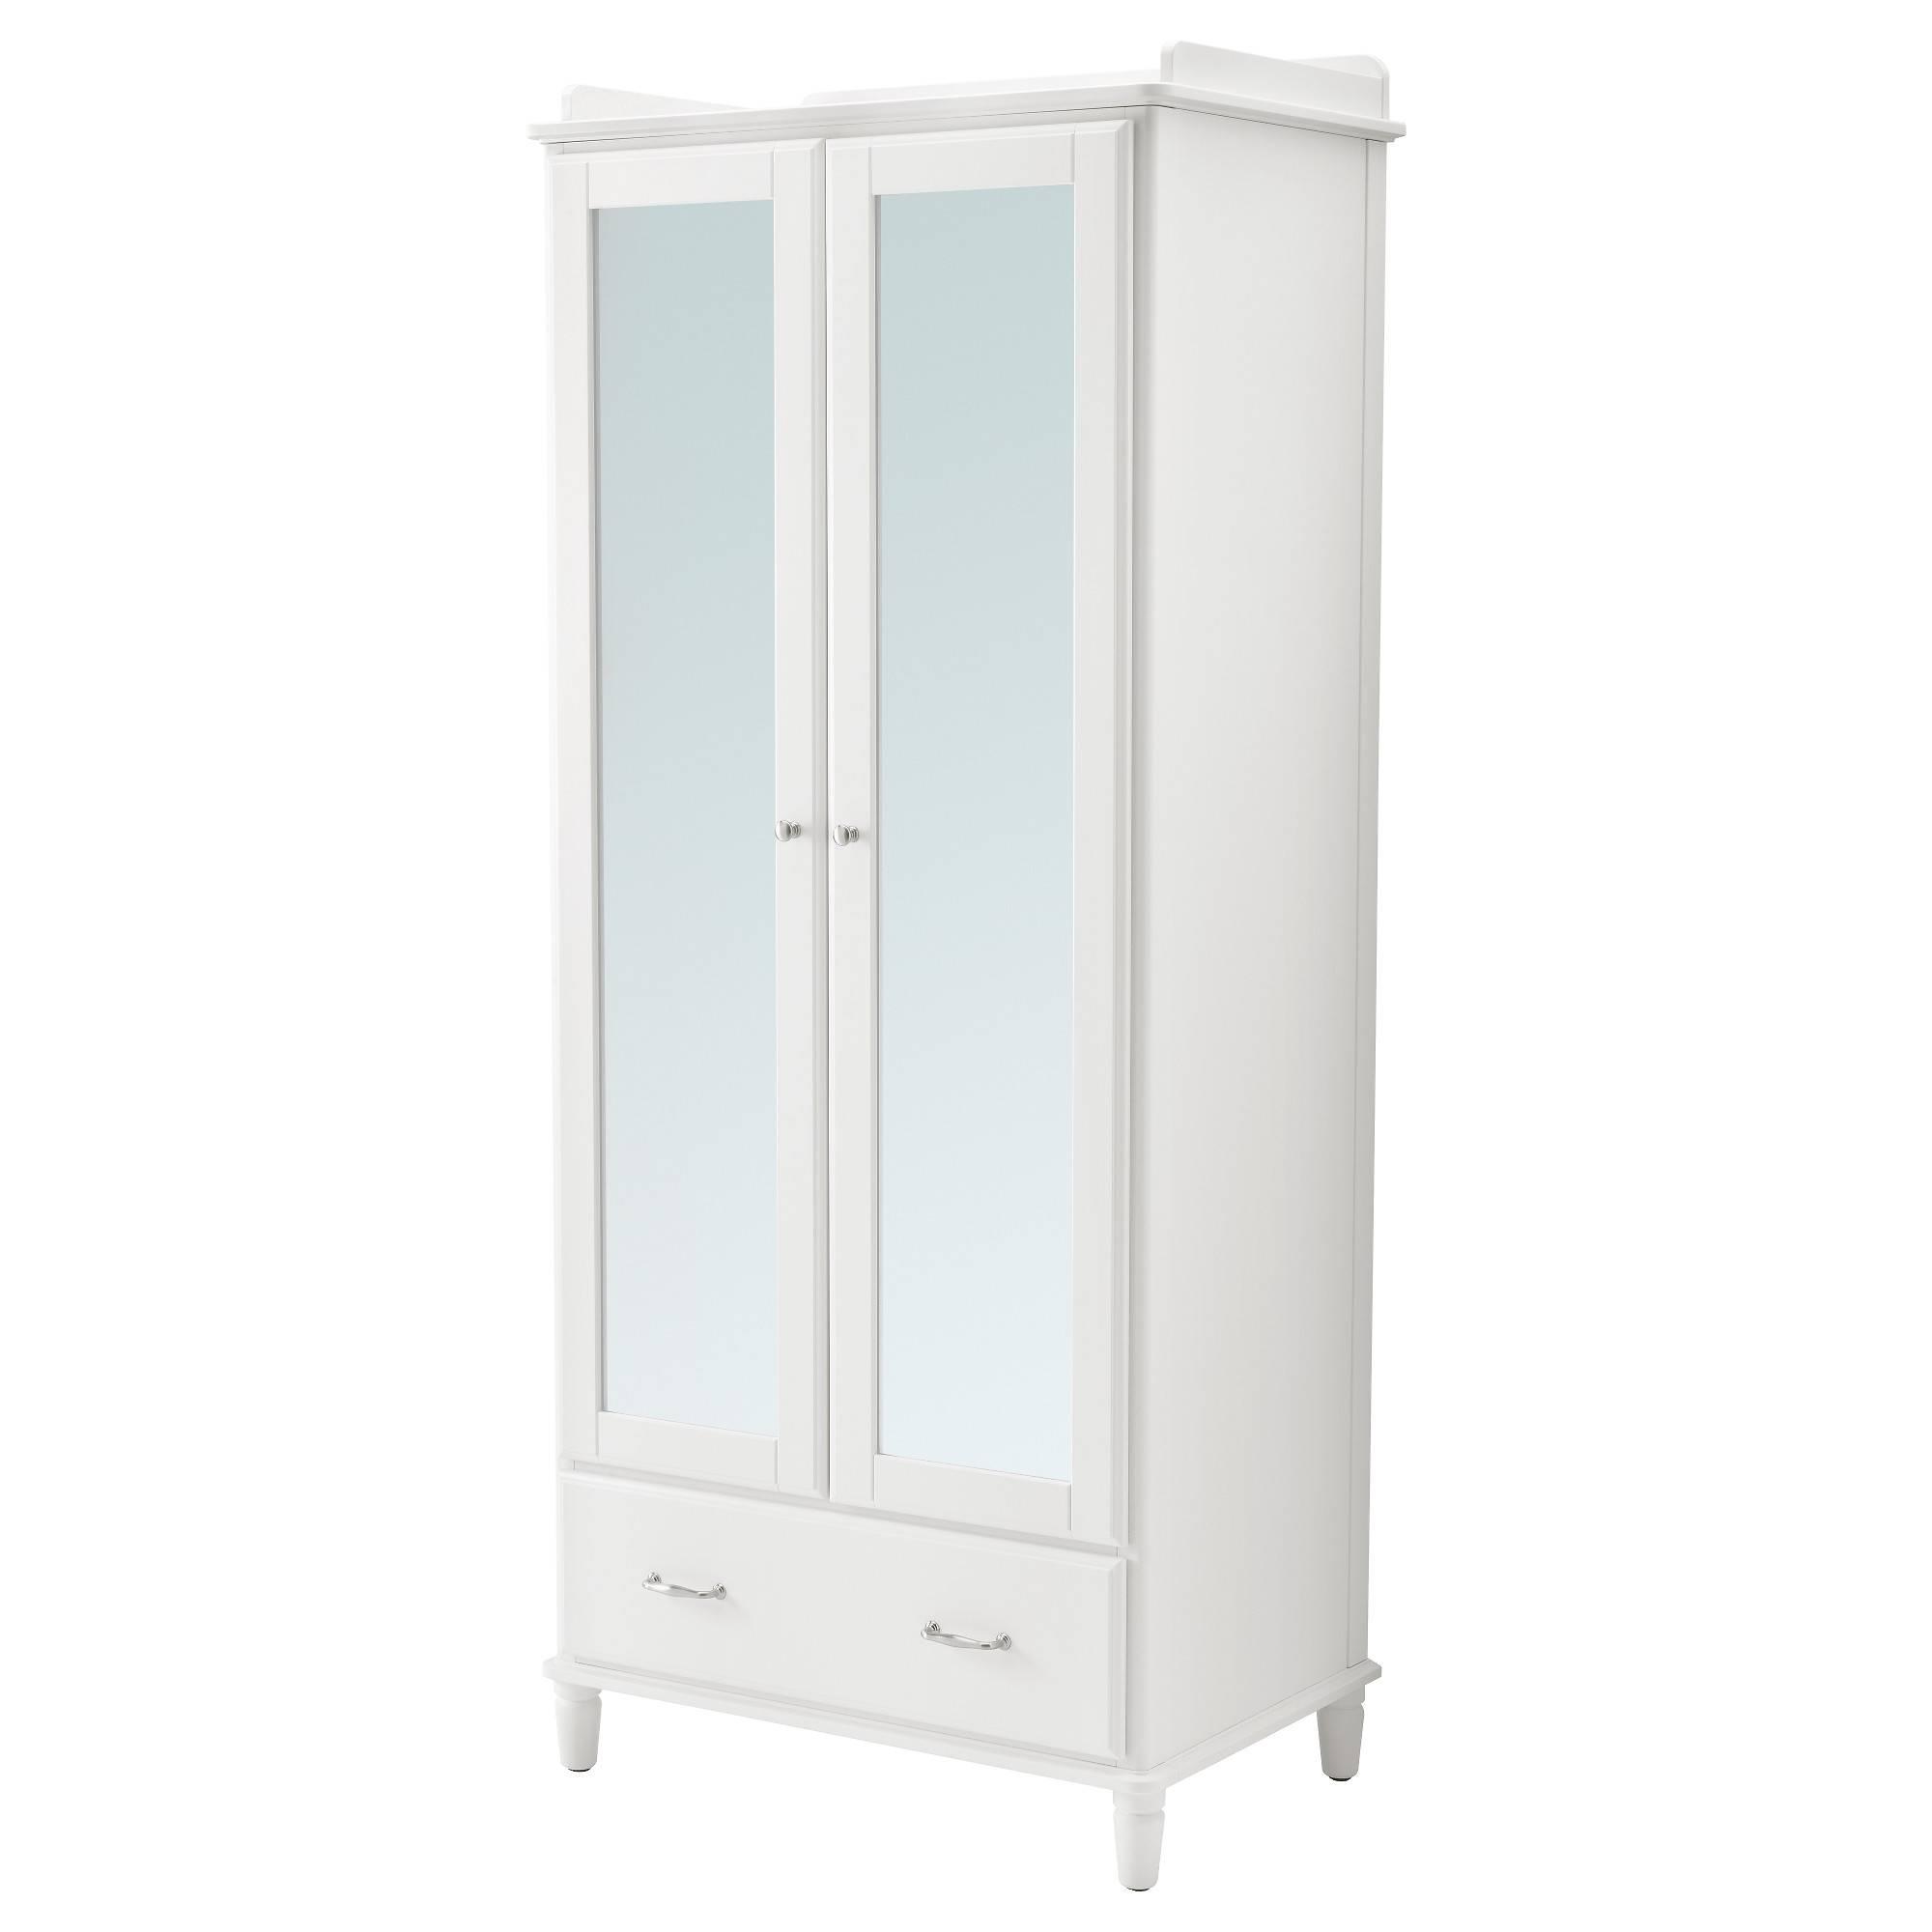 Wardrobes | Ikea in Single White Wardrobes (Image 13 of 15)